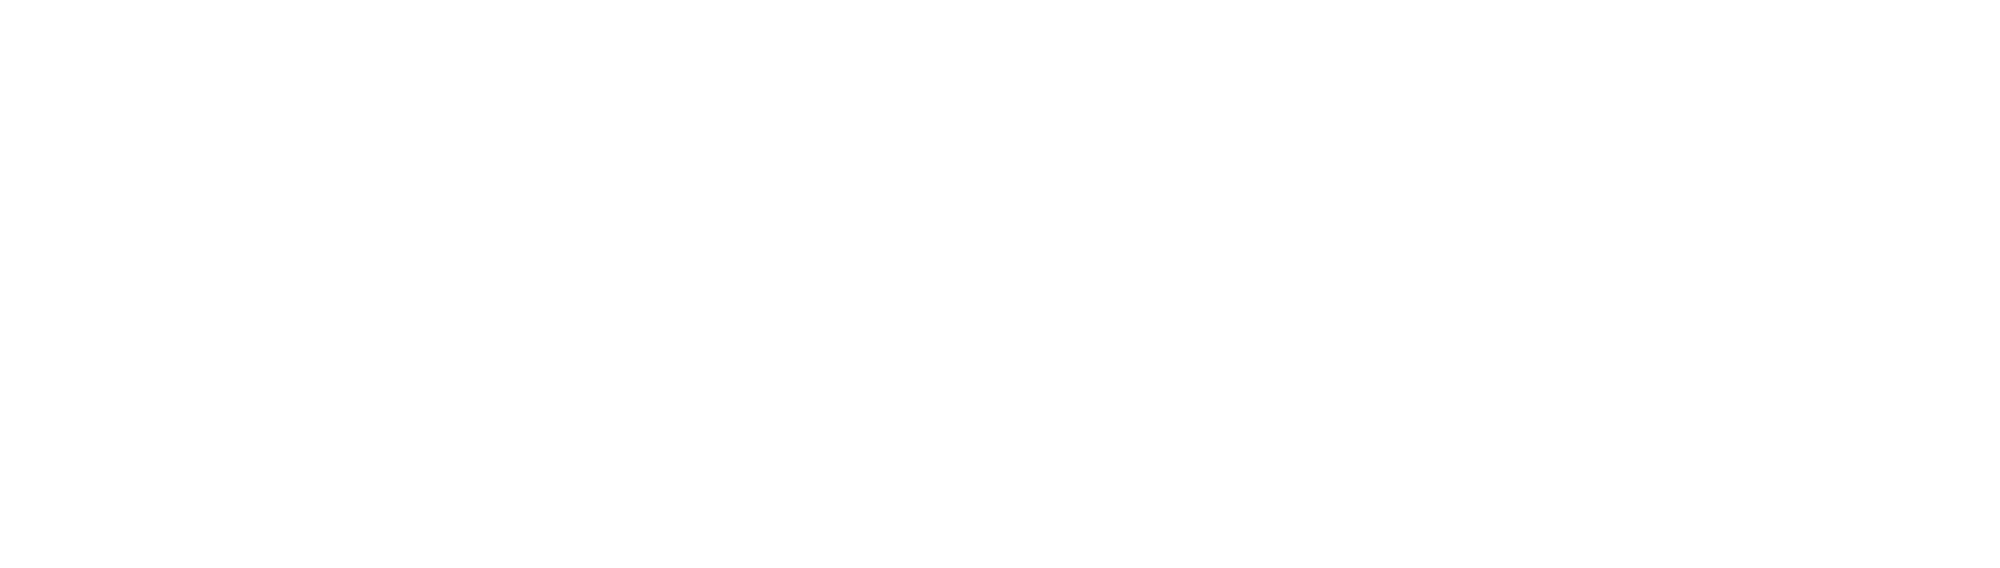 market leading port-centric logistics solutions